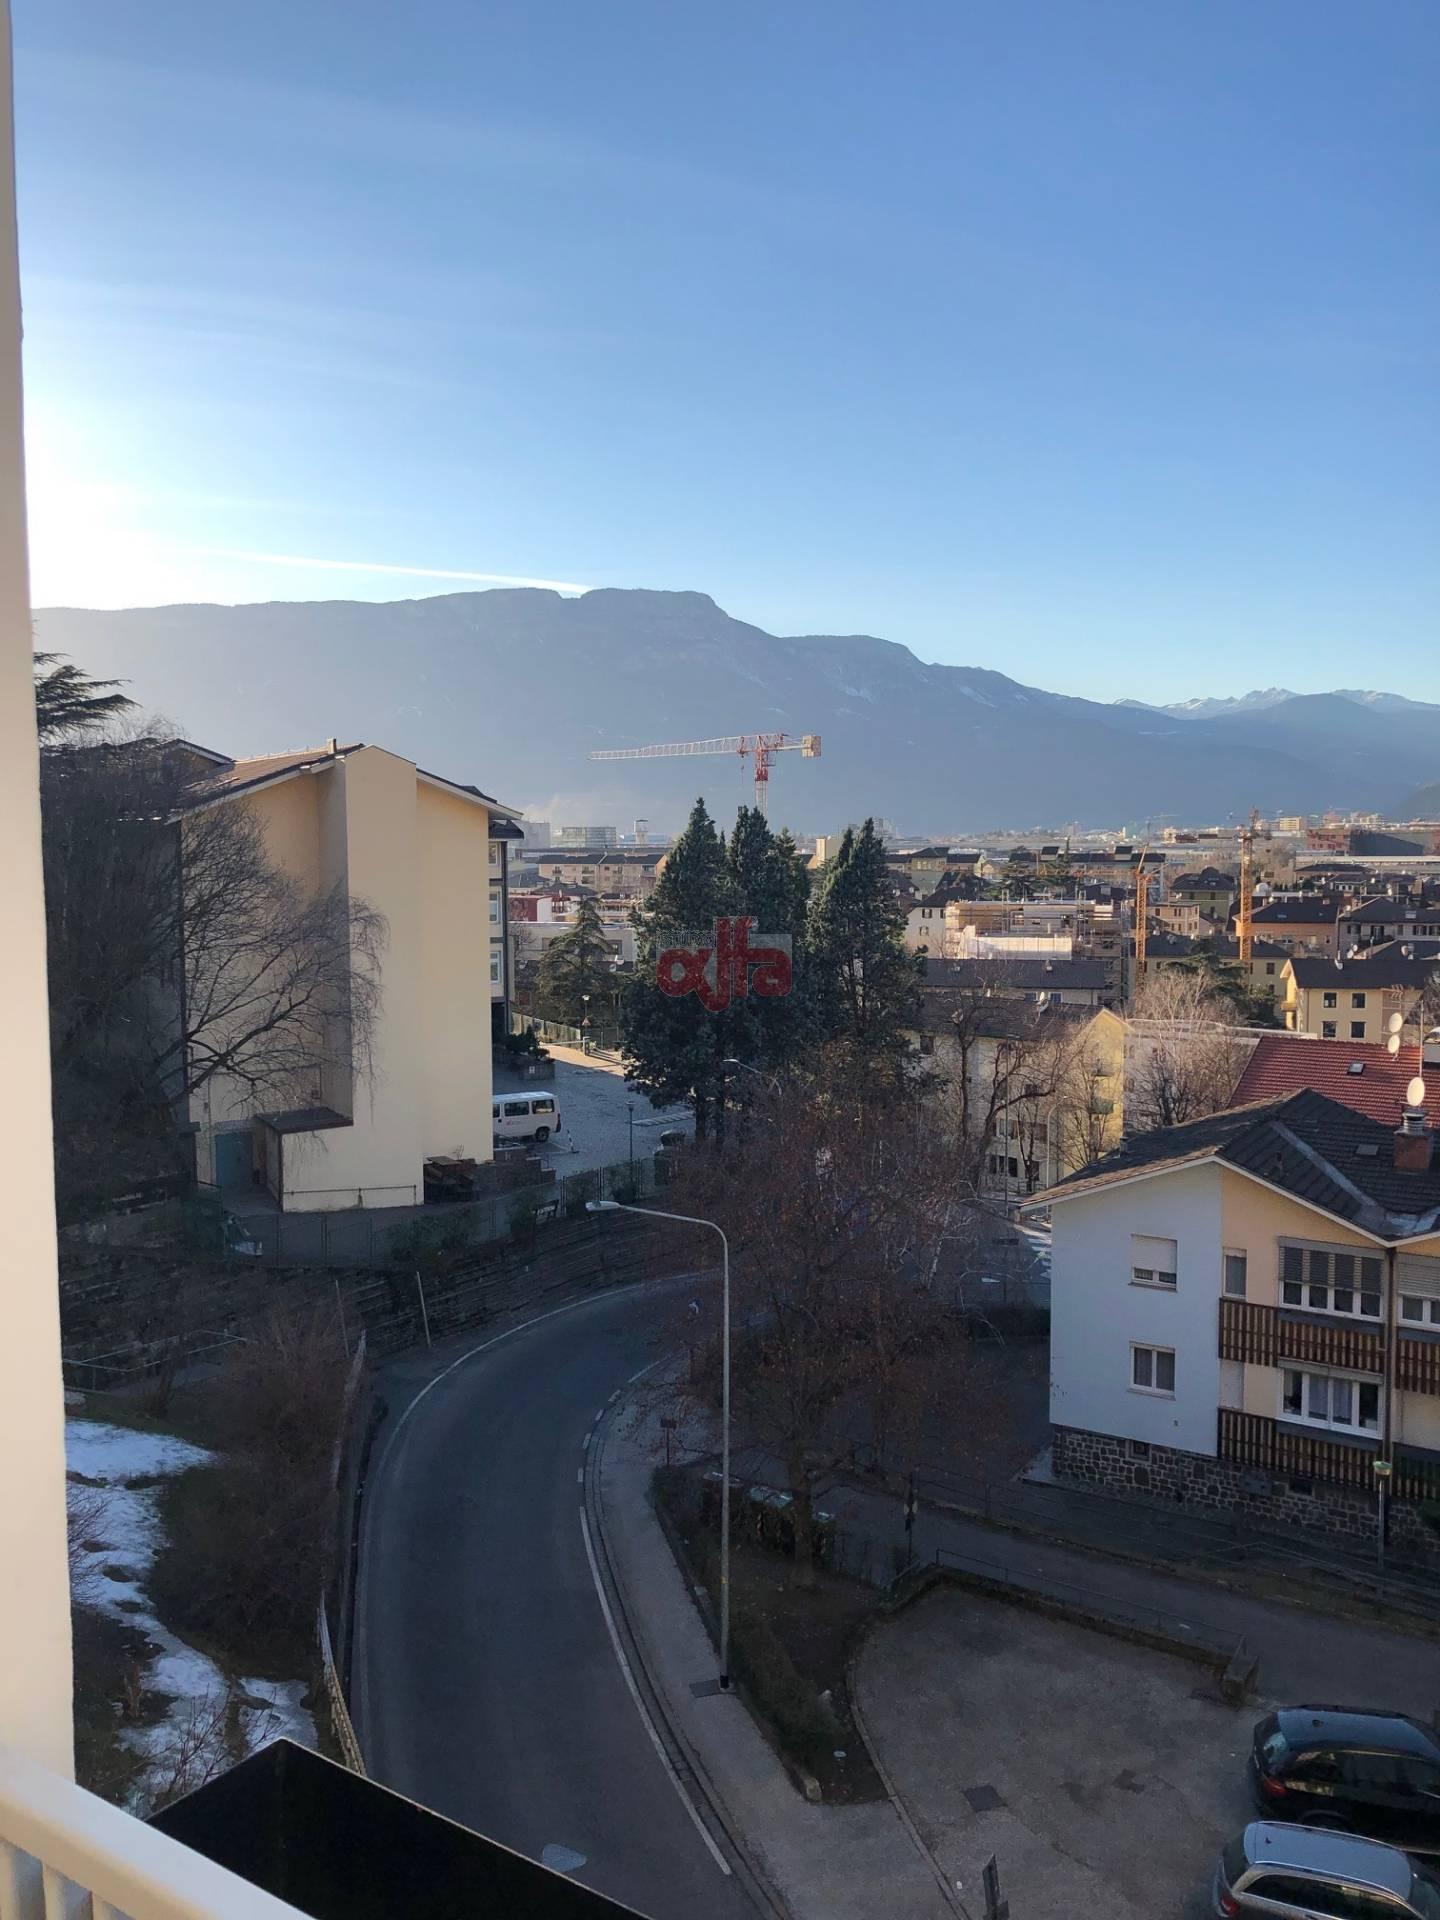 Bolzano - Bozen - Via castel weinegg